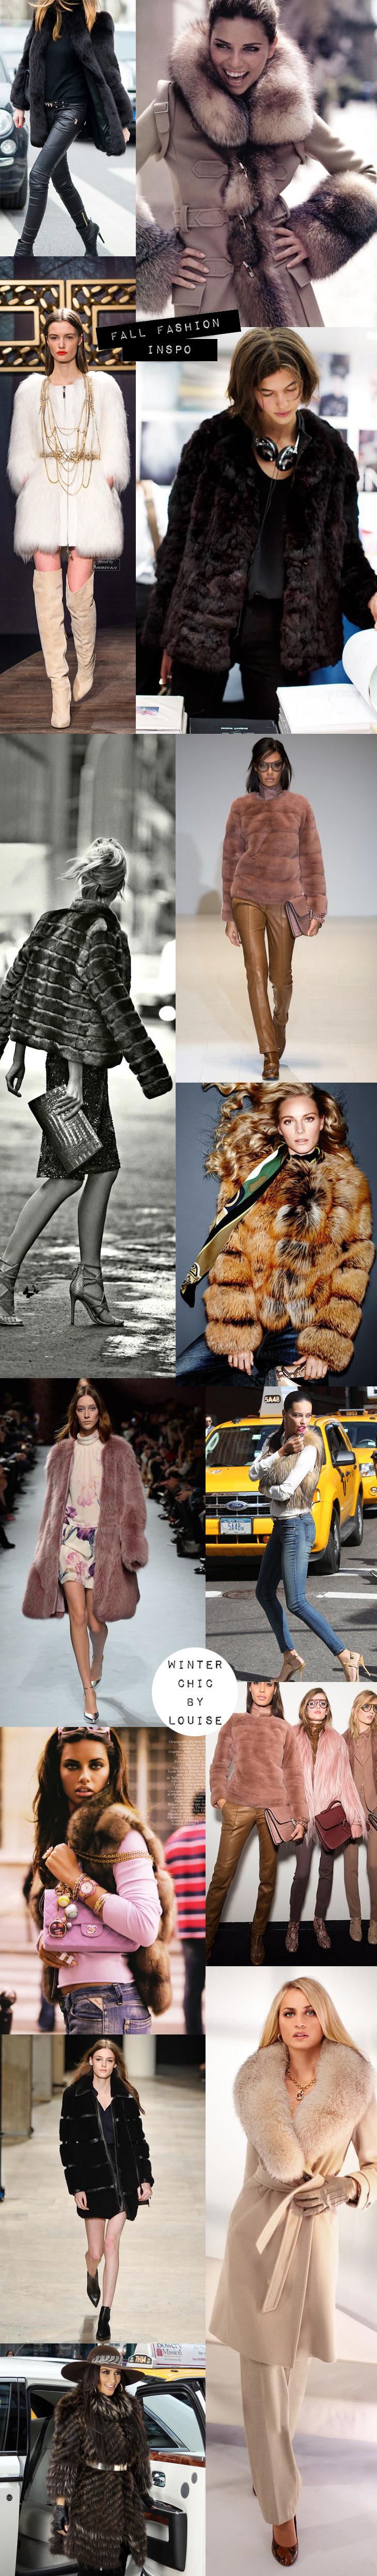 fur season winter chic fall winter 2015 winter clothes trends ideas fake fur real fur fusk päls äkta päls